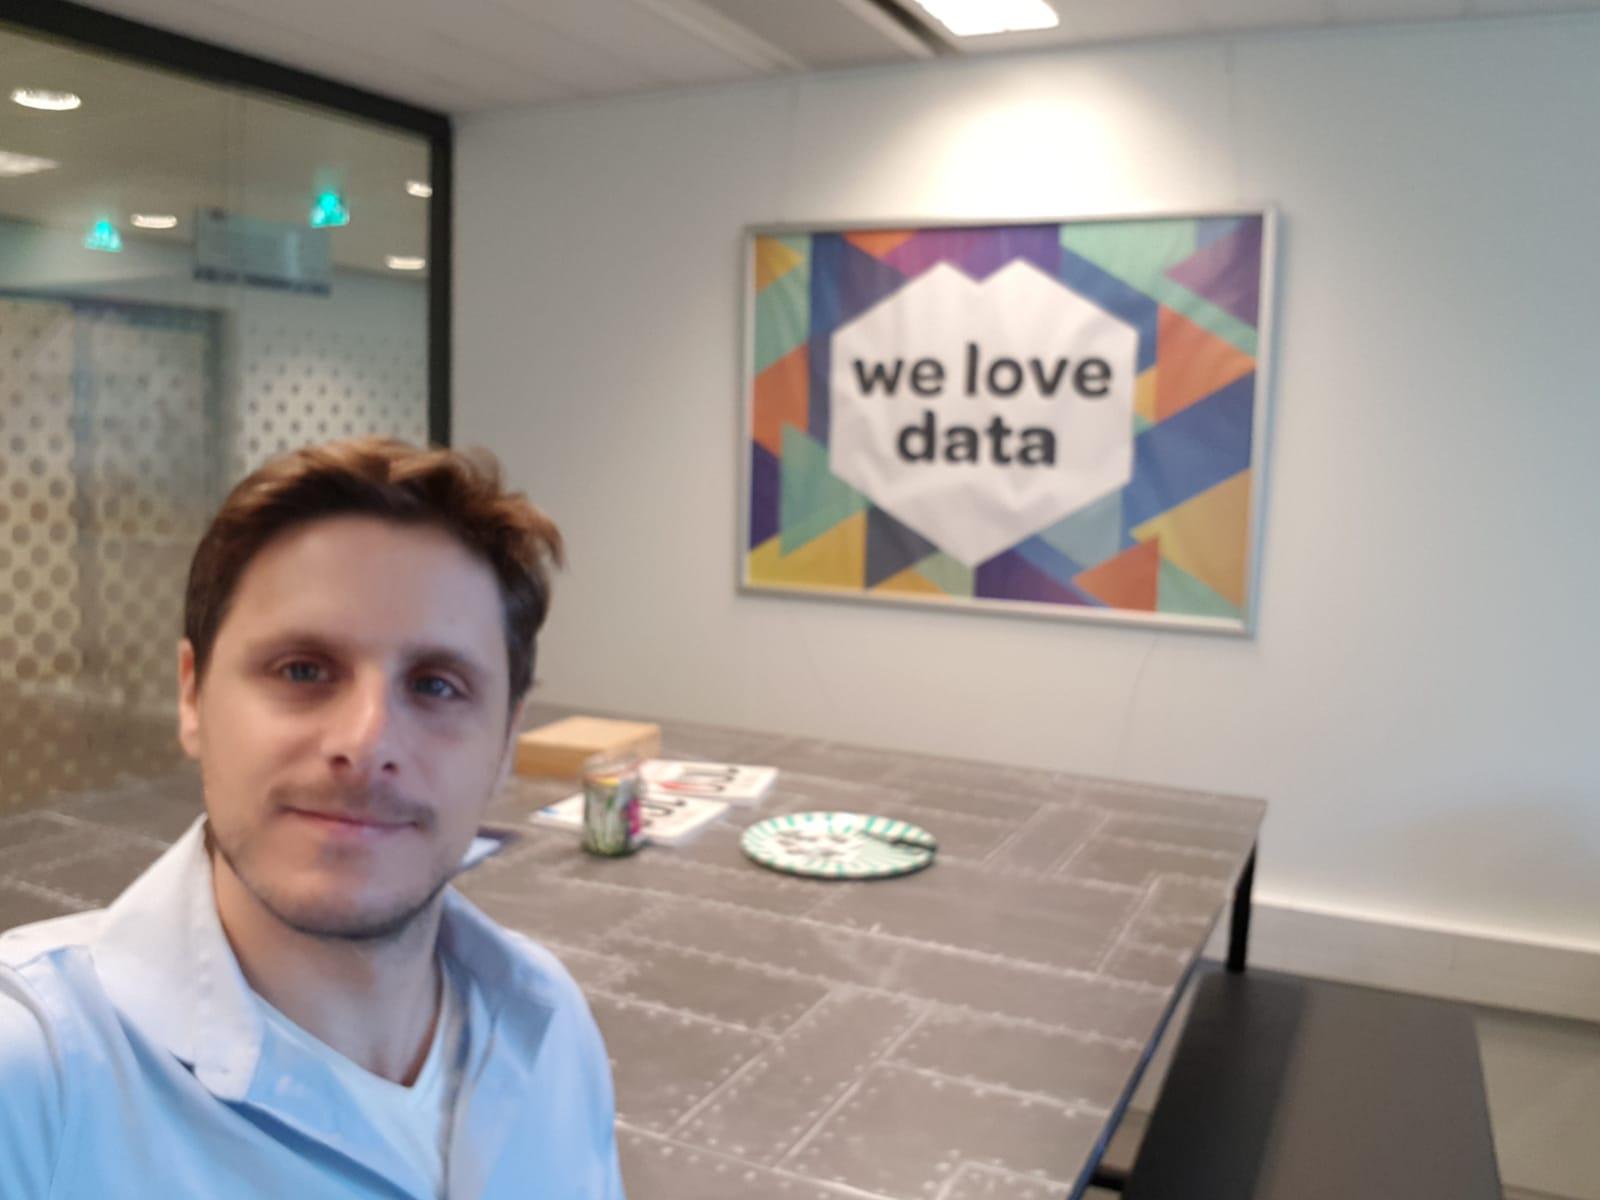 Or Lenchner - We Love Data - indoor selfie at Amsterdam University of Applied Sciences